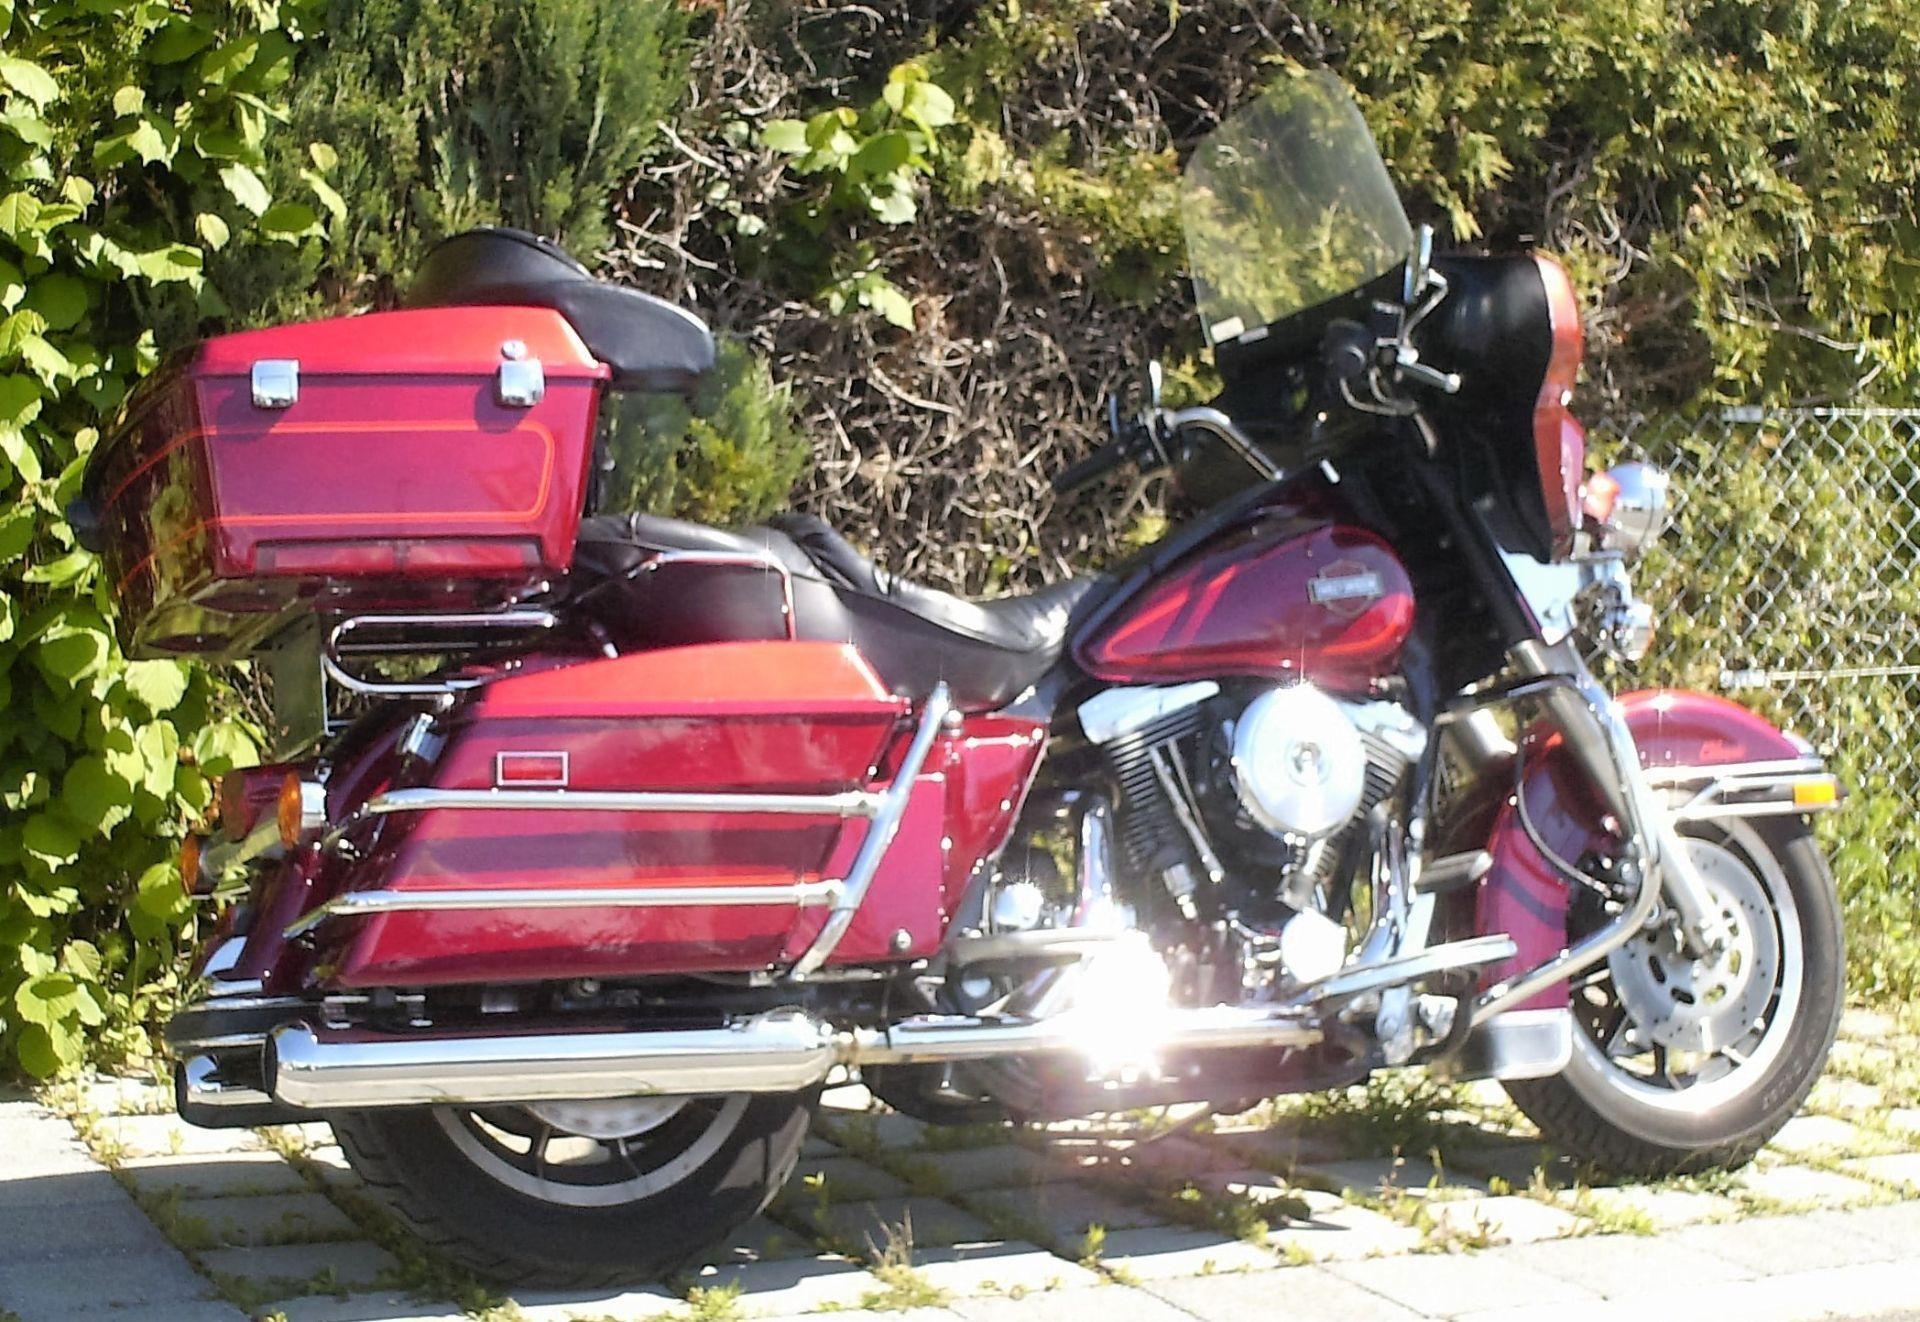 motorrad occasion kaufen harley davidson flhtc 1340 electra glide classic bikes 2 rock thun. Black Bedroom Furniture Sets. Home Design Ideas